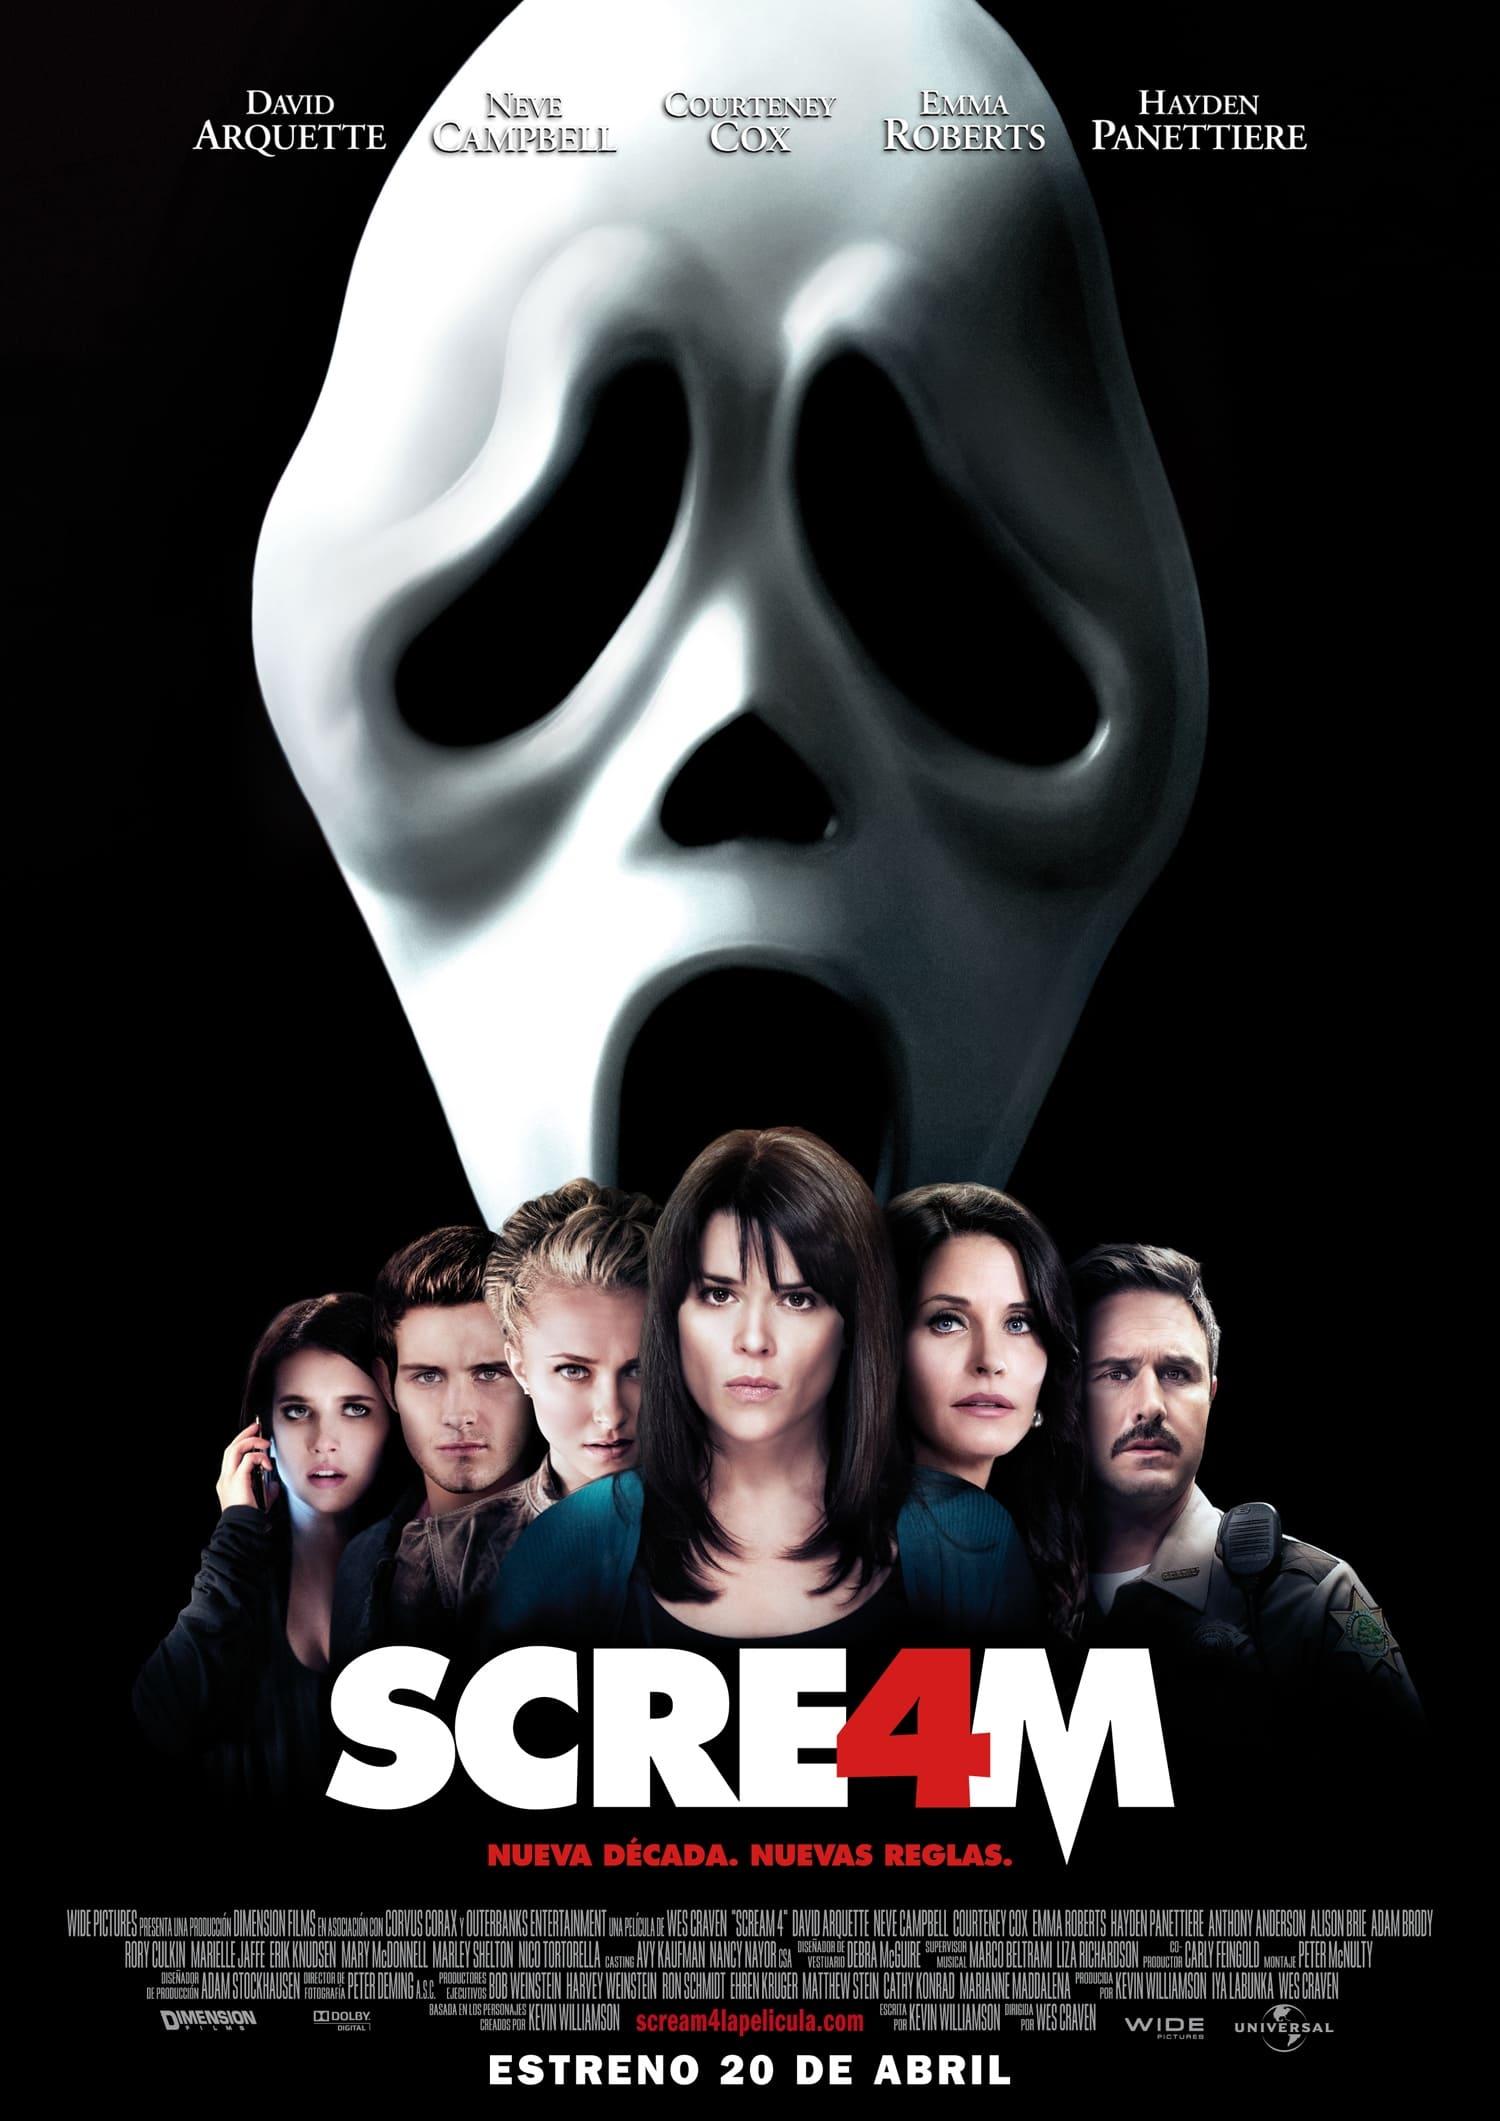 Póster Scream 4